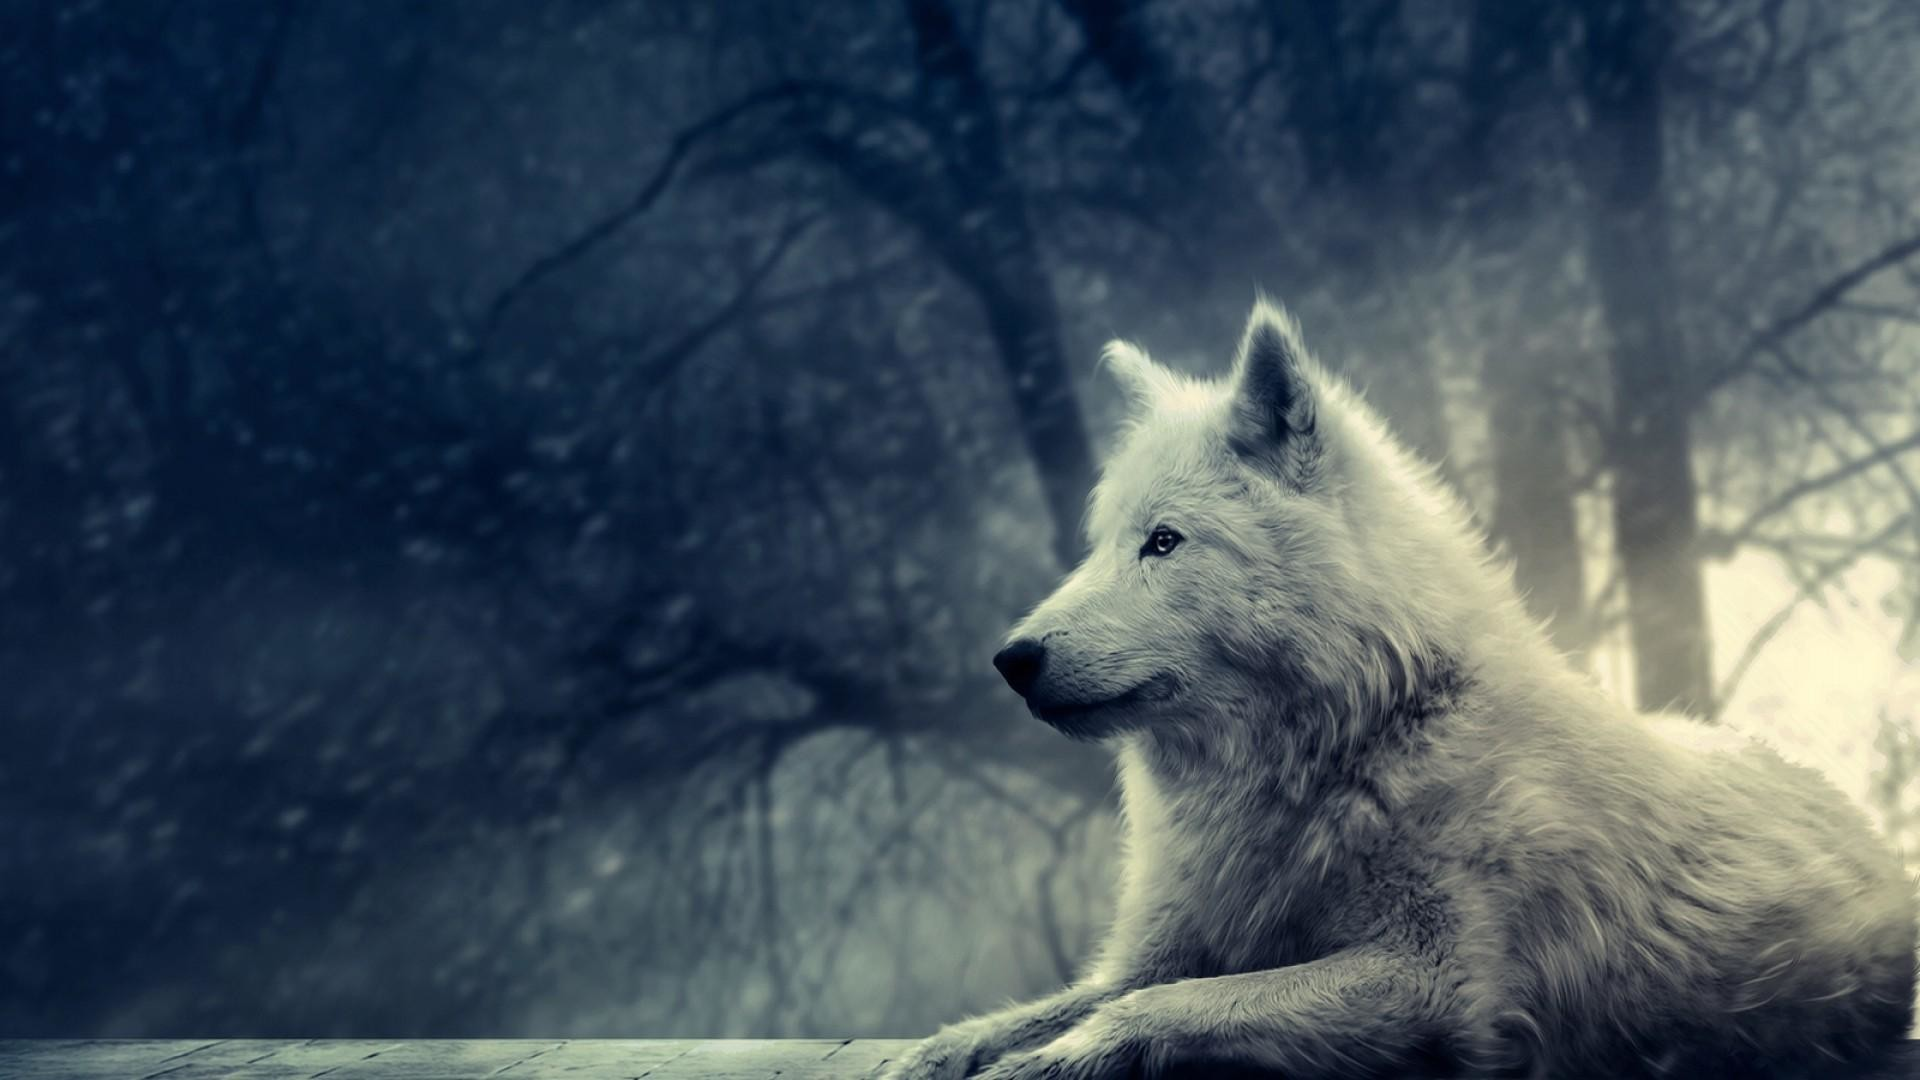 wolf backgrounds for desktop (64+ images)